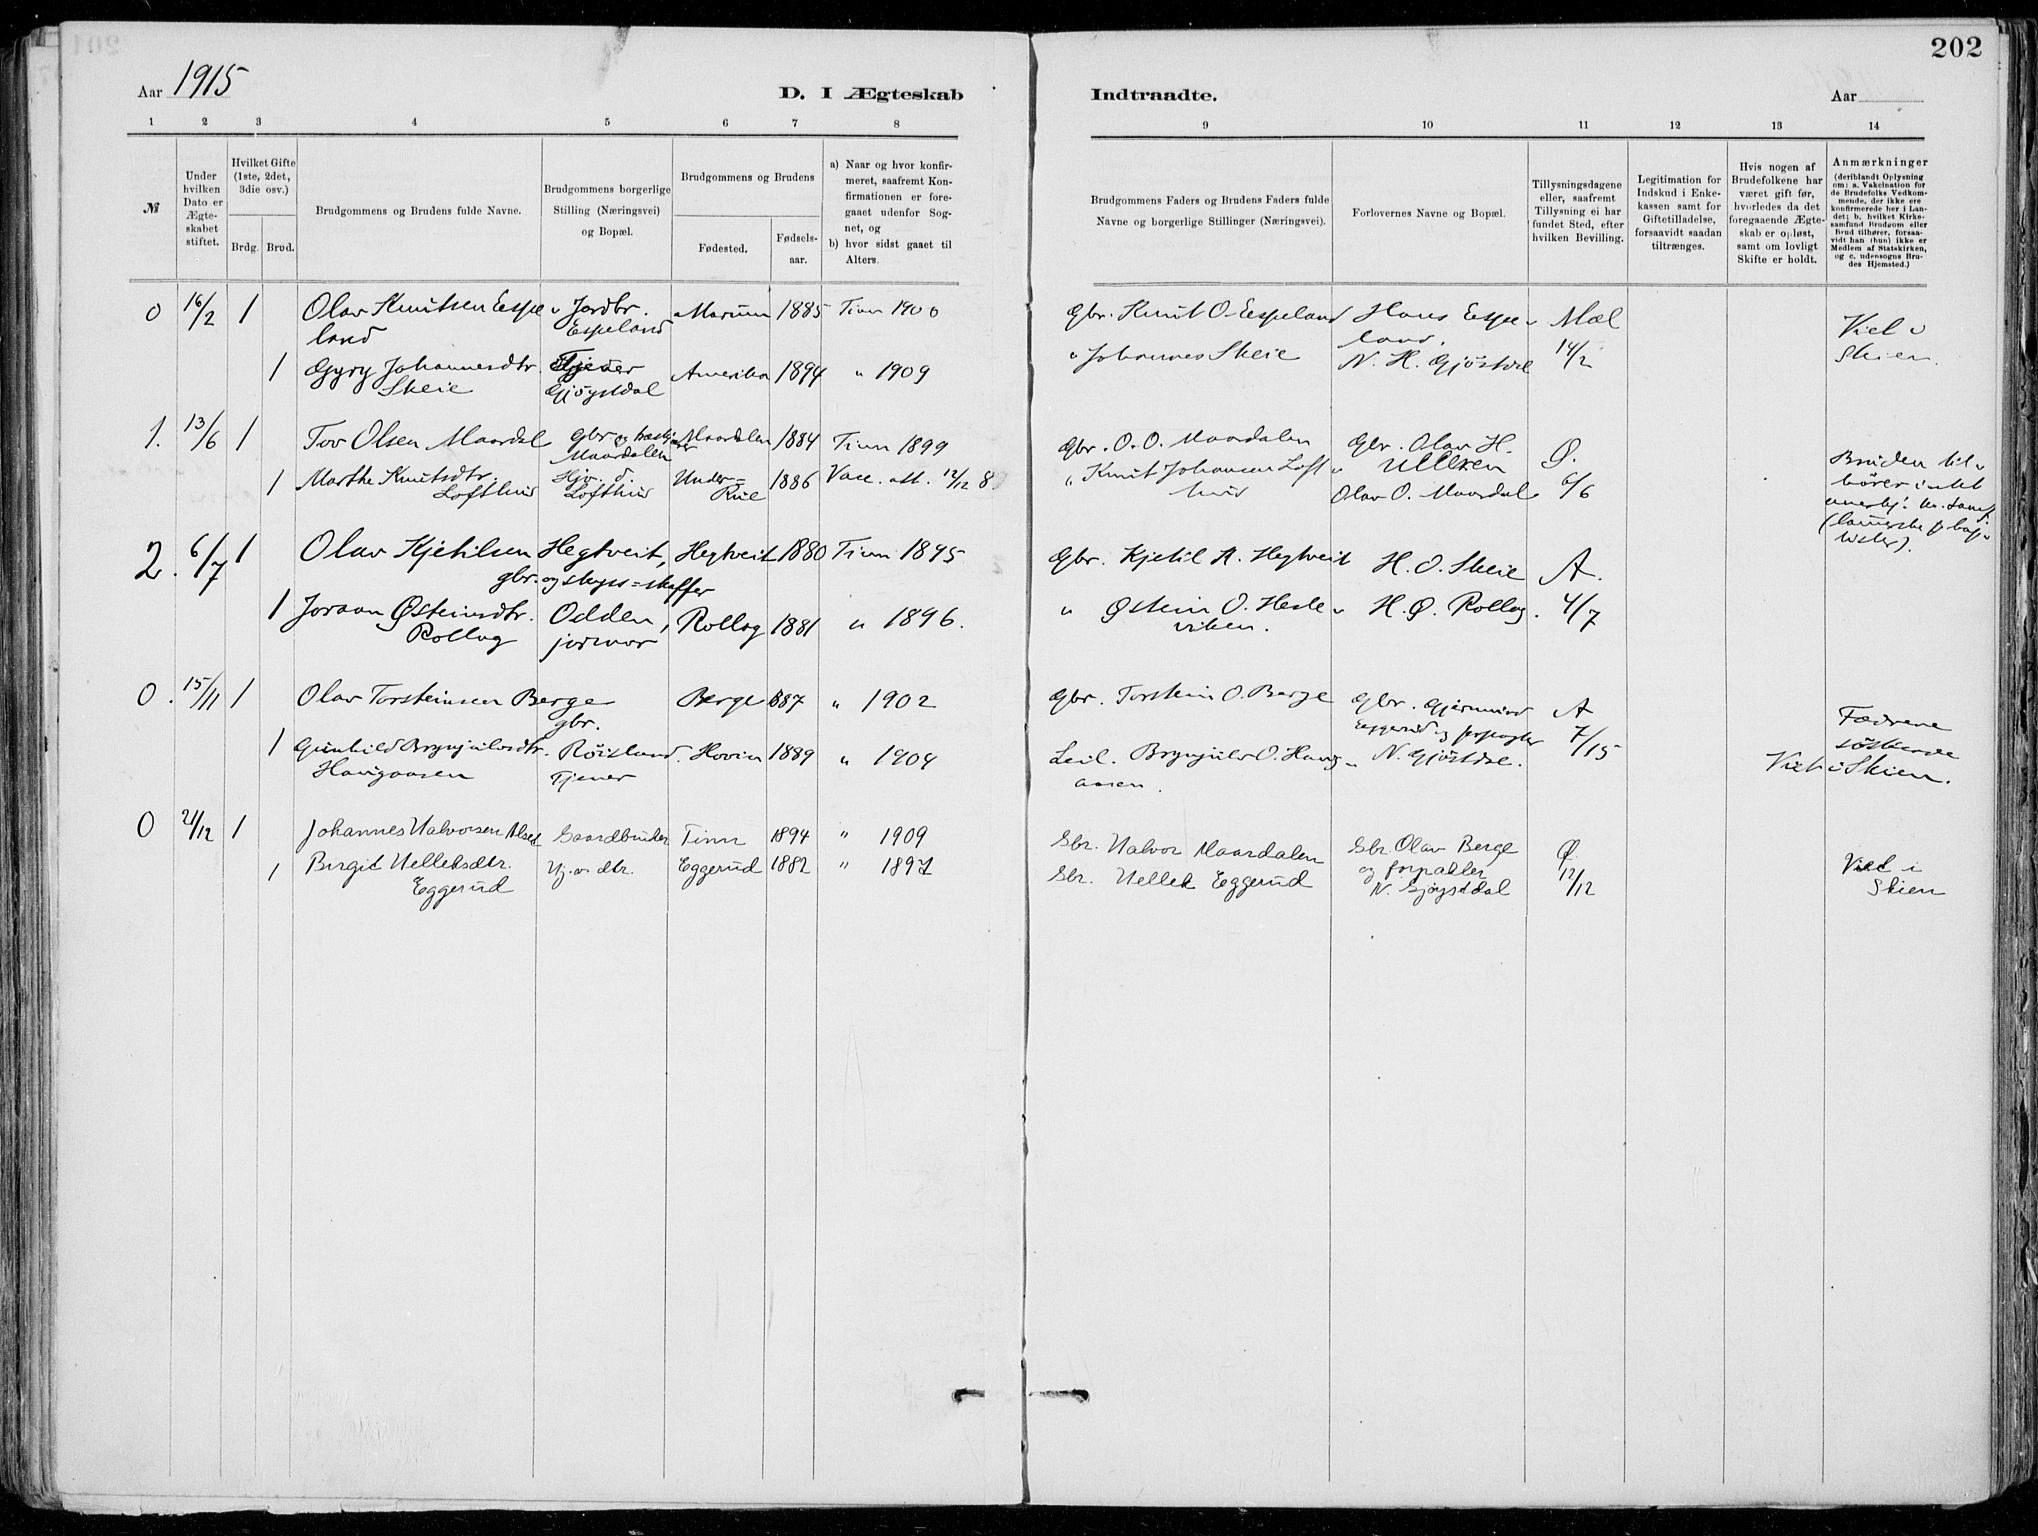 SAKO, Tinn kirkebøker, F/Fa/L0007: Ministerialbok nr. I 7, 1878-1922, s. 202